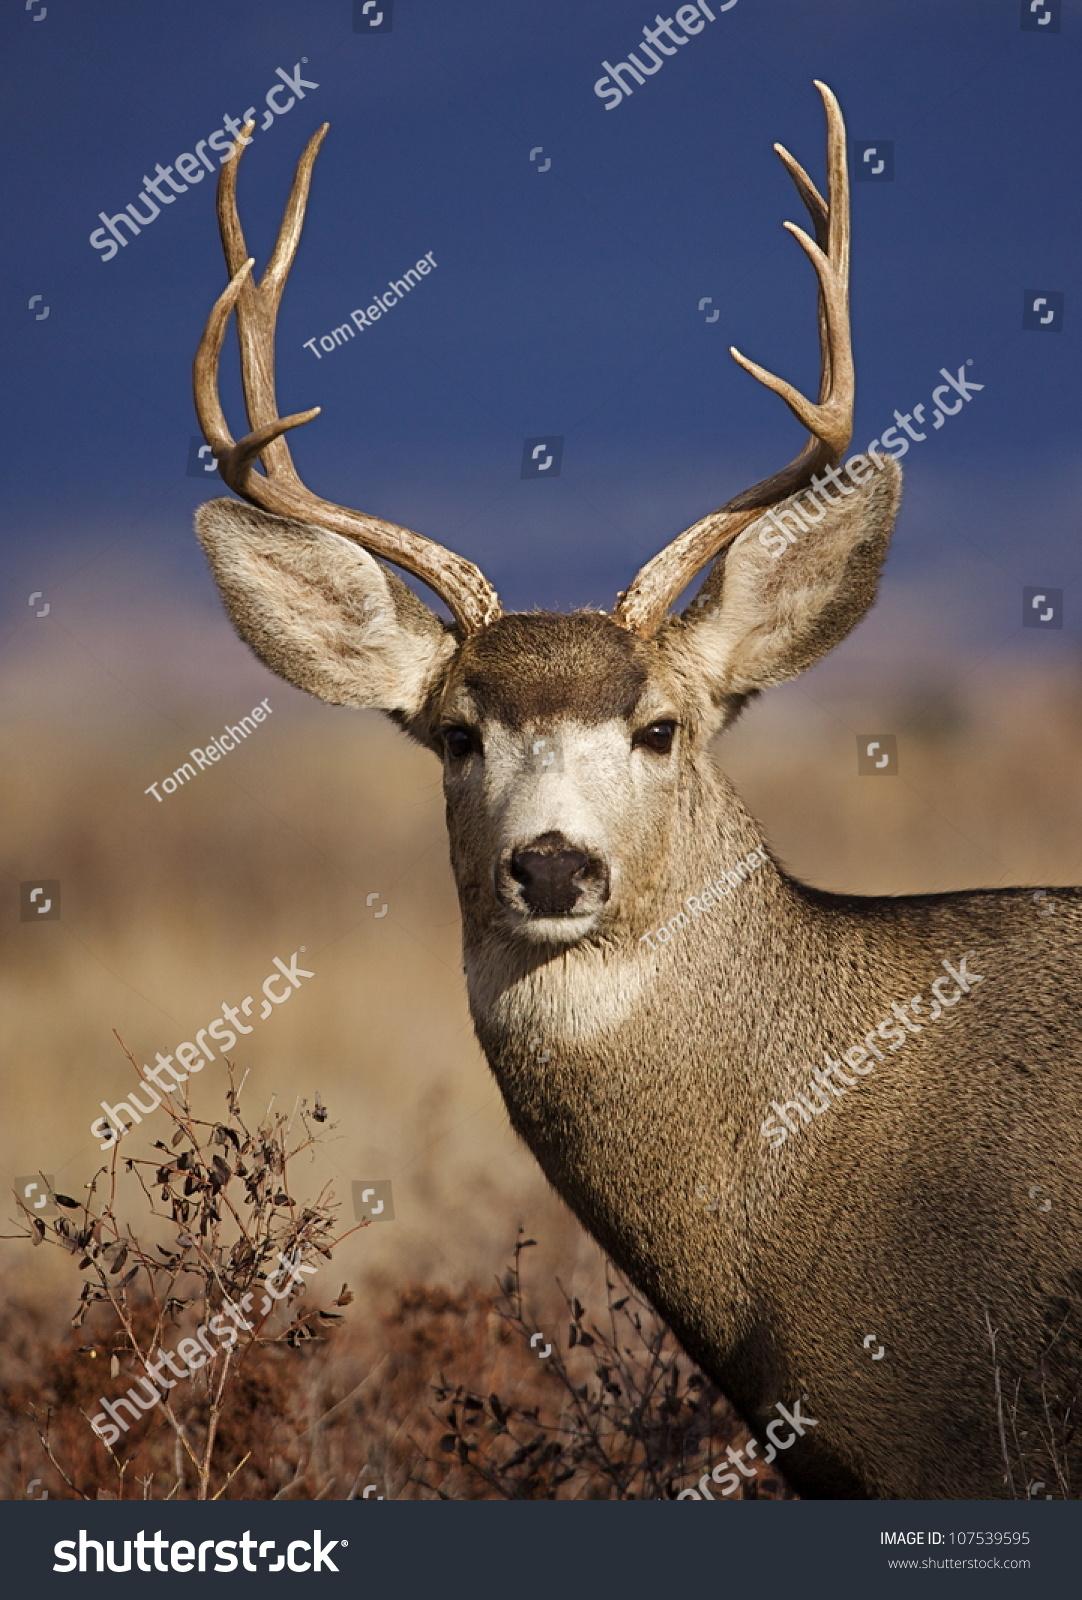 Mule Deer Buck Portrait, In Warm Evening Light With Striking Blue Background Stock Photo 107539595 : Shutterstock